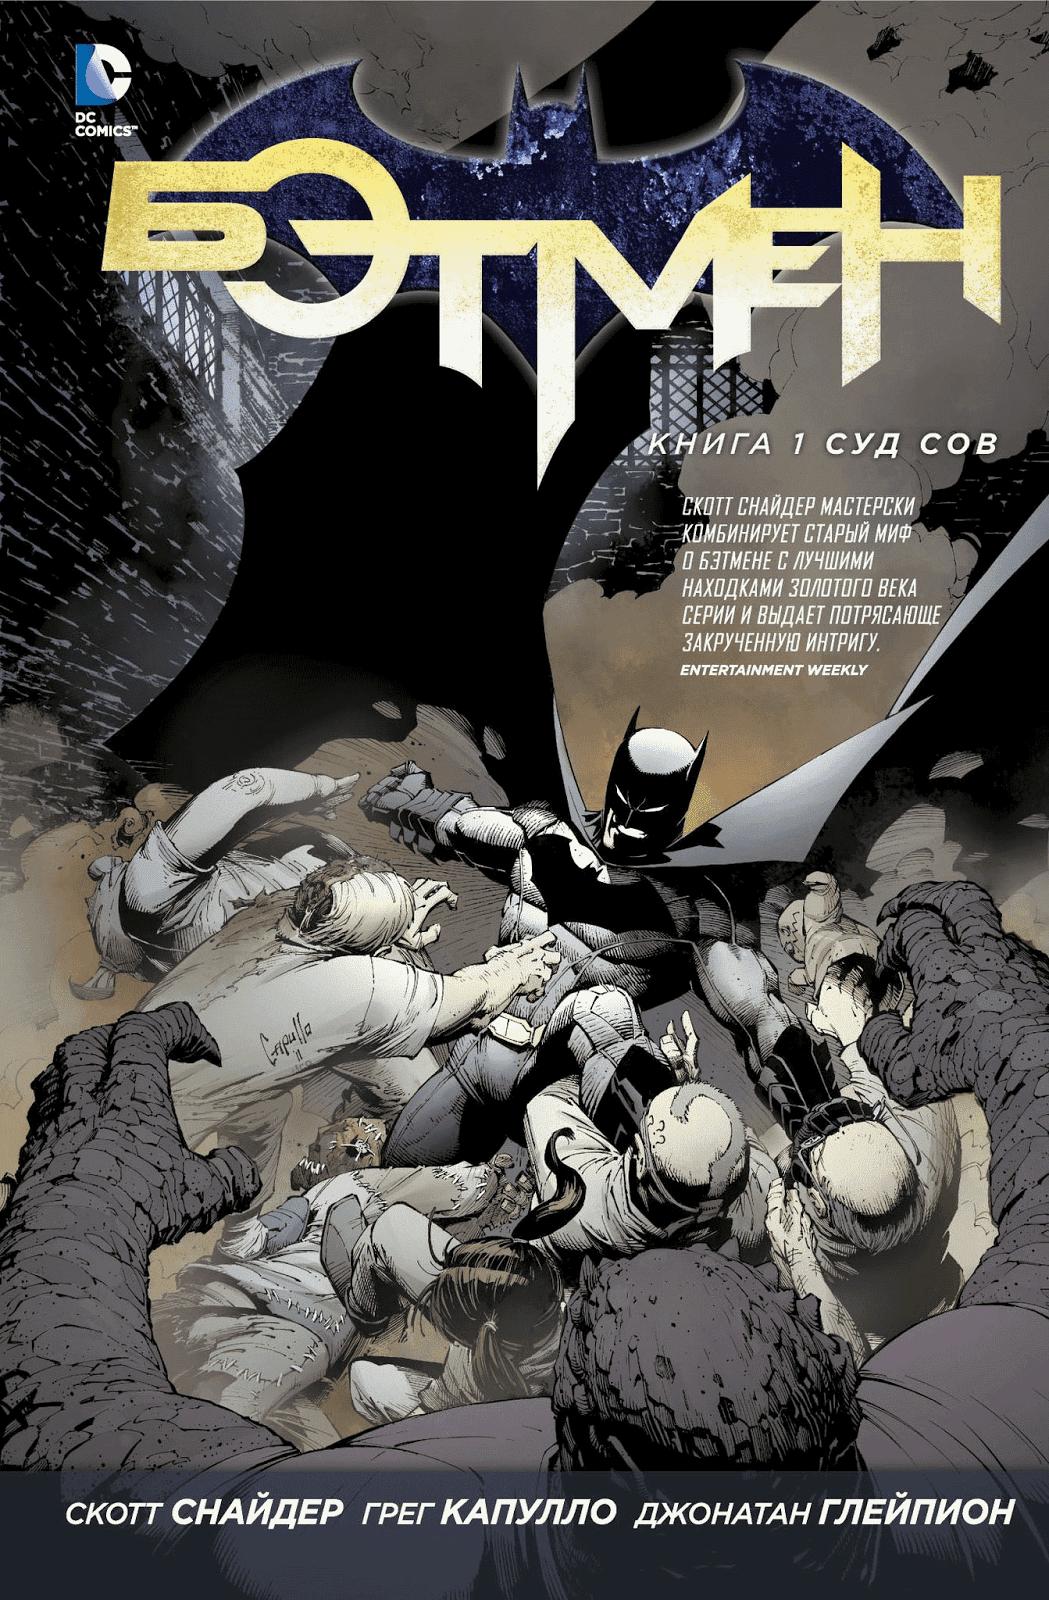 Комикс «Бэтмен. Книга 1. Суд Сов» (2012)